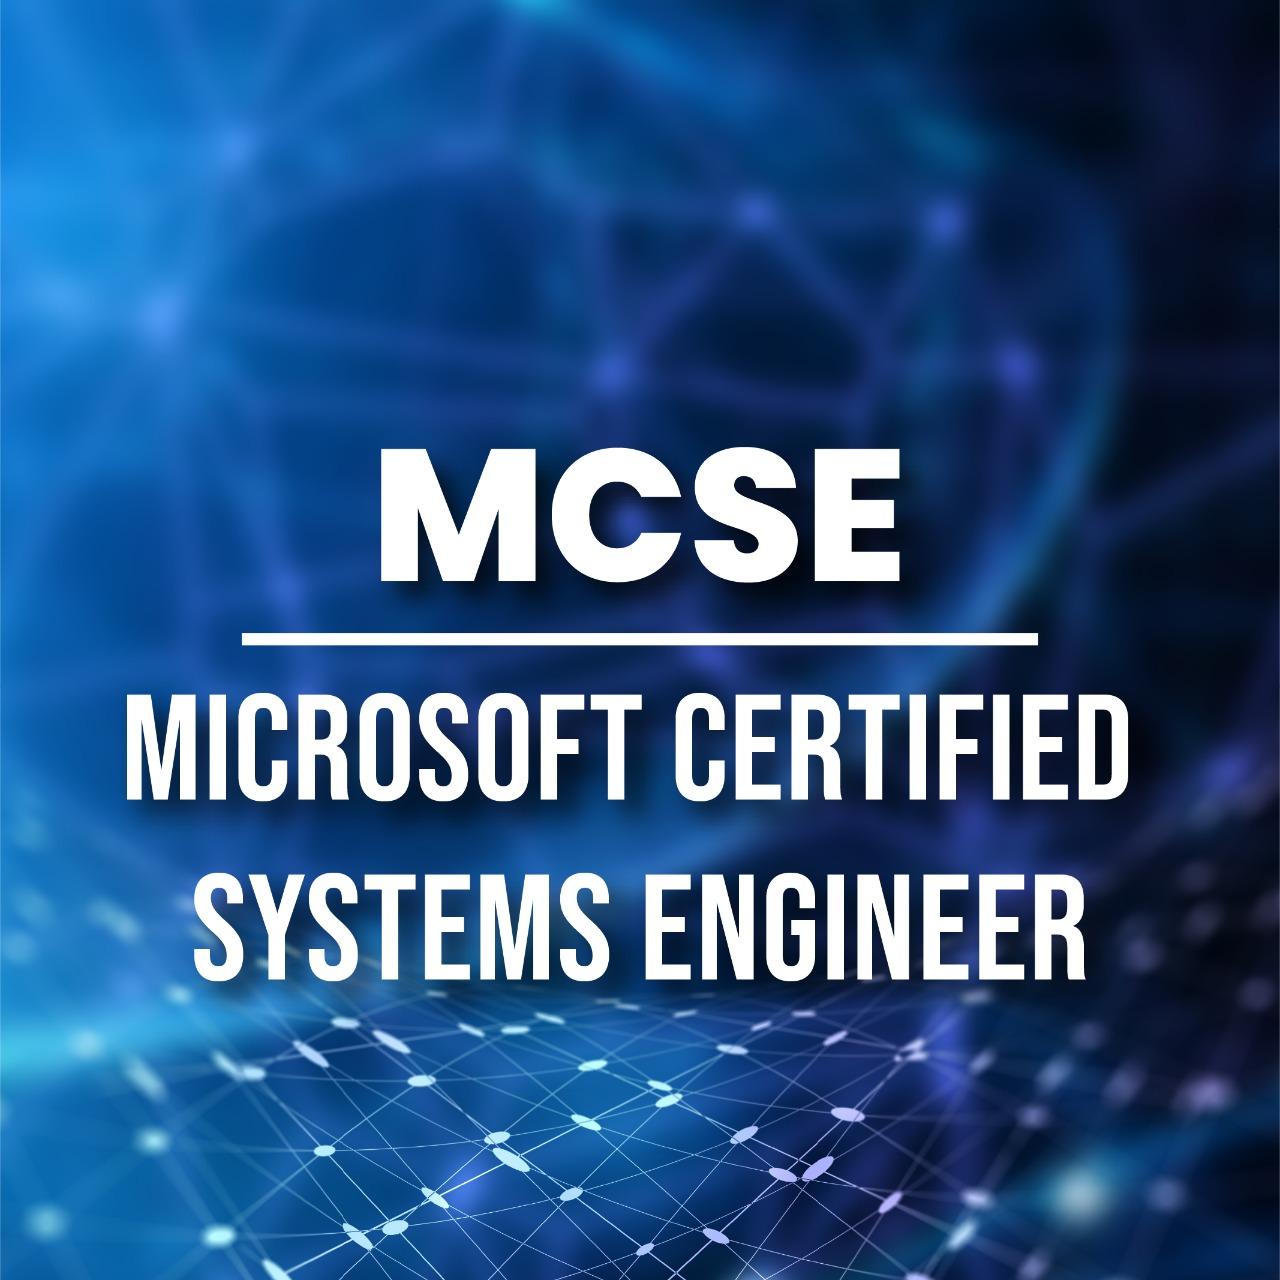 MCSE (Microsoft Certified System Engineer)